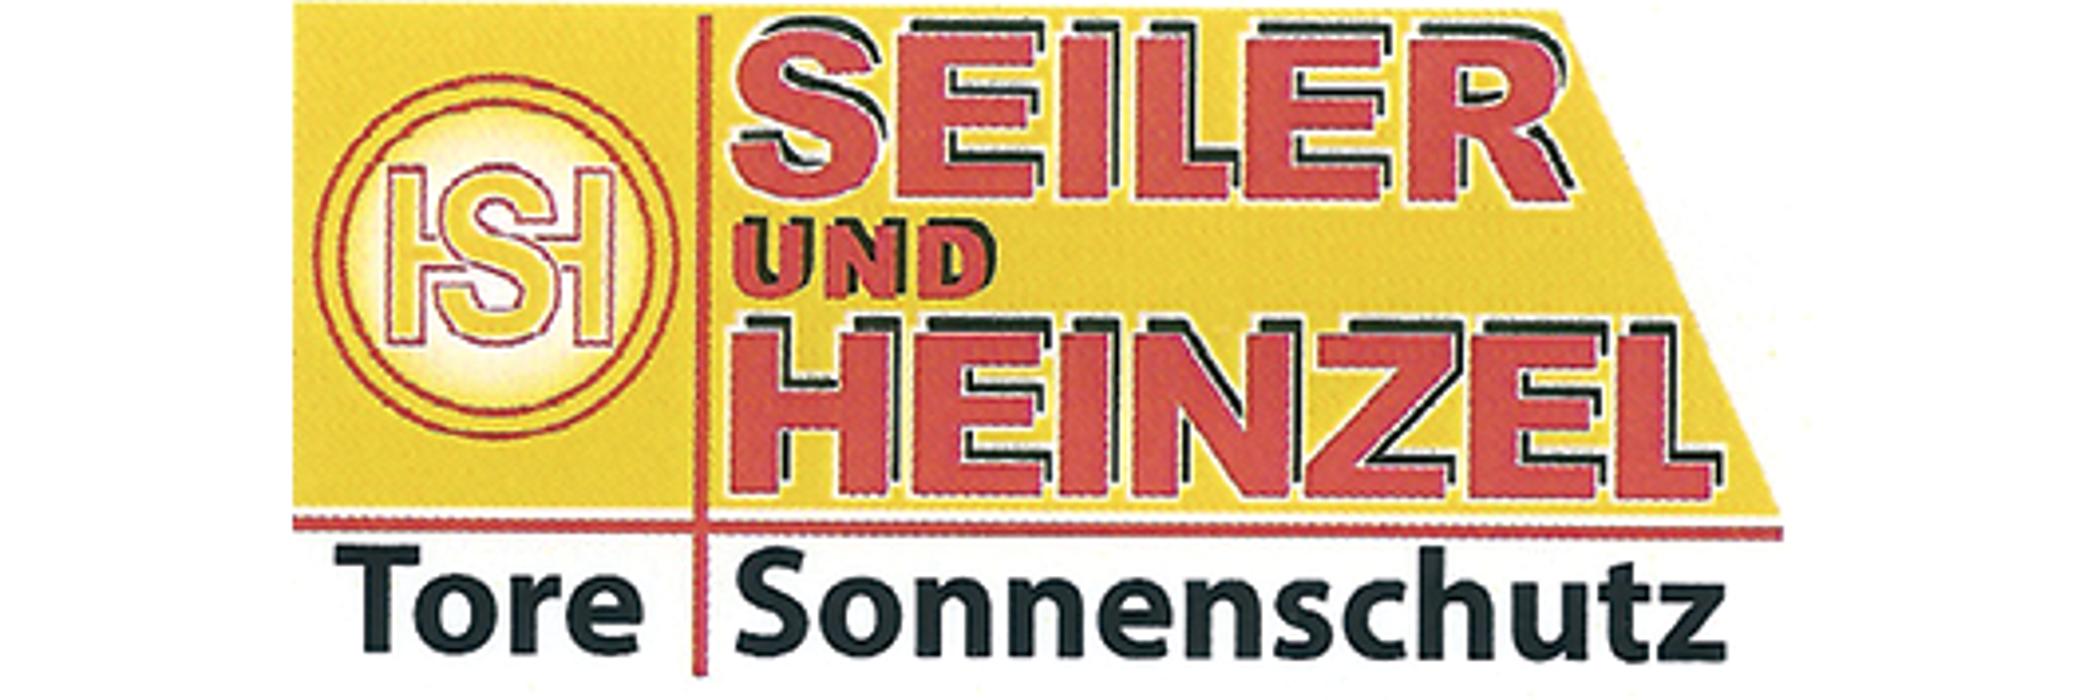 Bild zu Seiler u. Heinzel GmbH in Ergolding